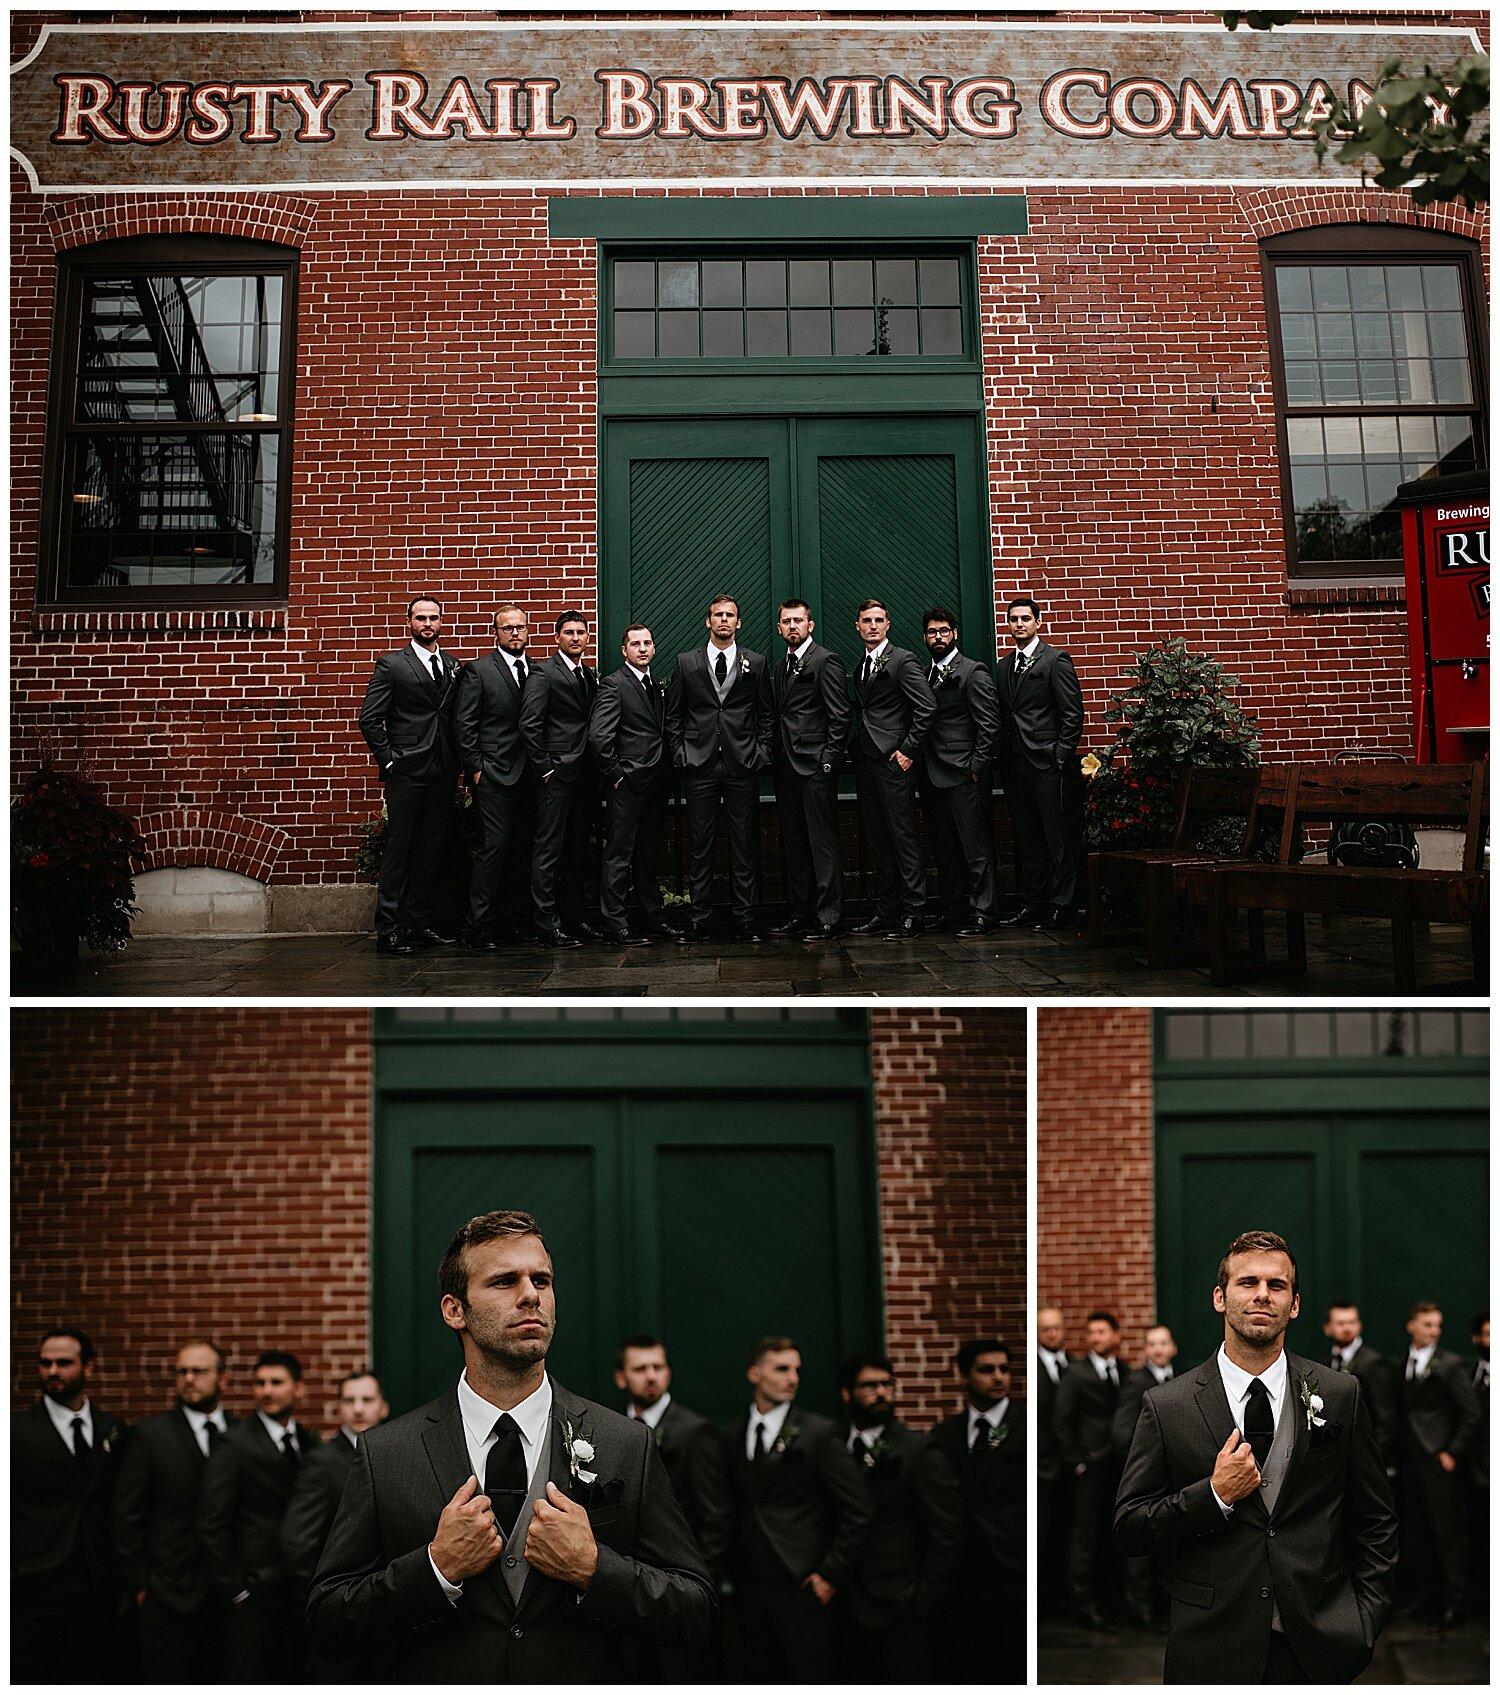 NEPA-Lewisburg-Wedding-Photographer-at-the-Rusty-Rail_0028.jpg